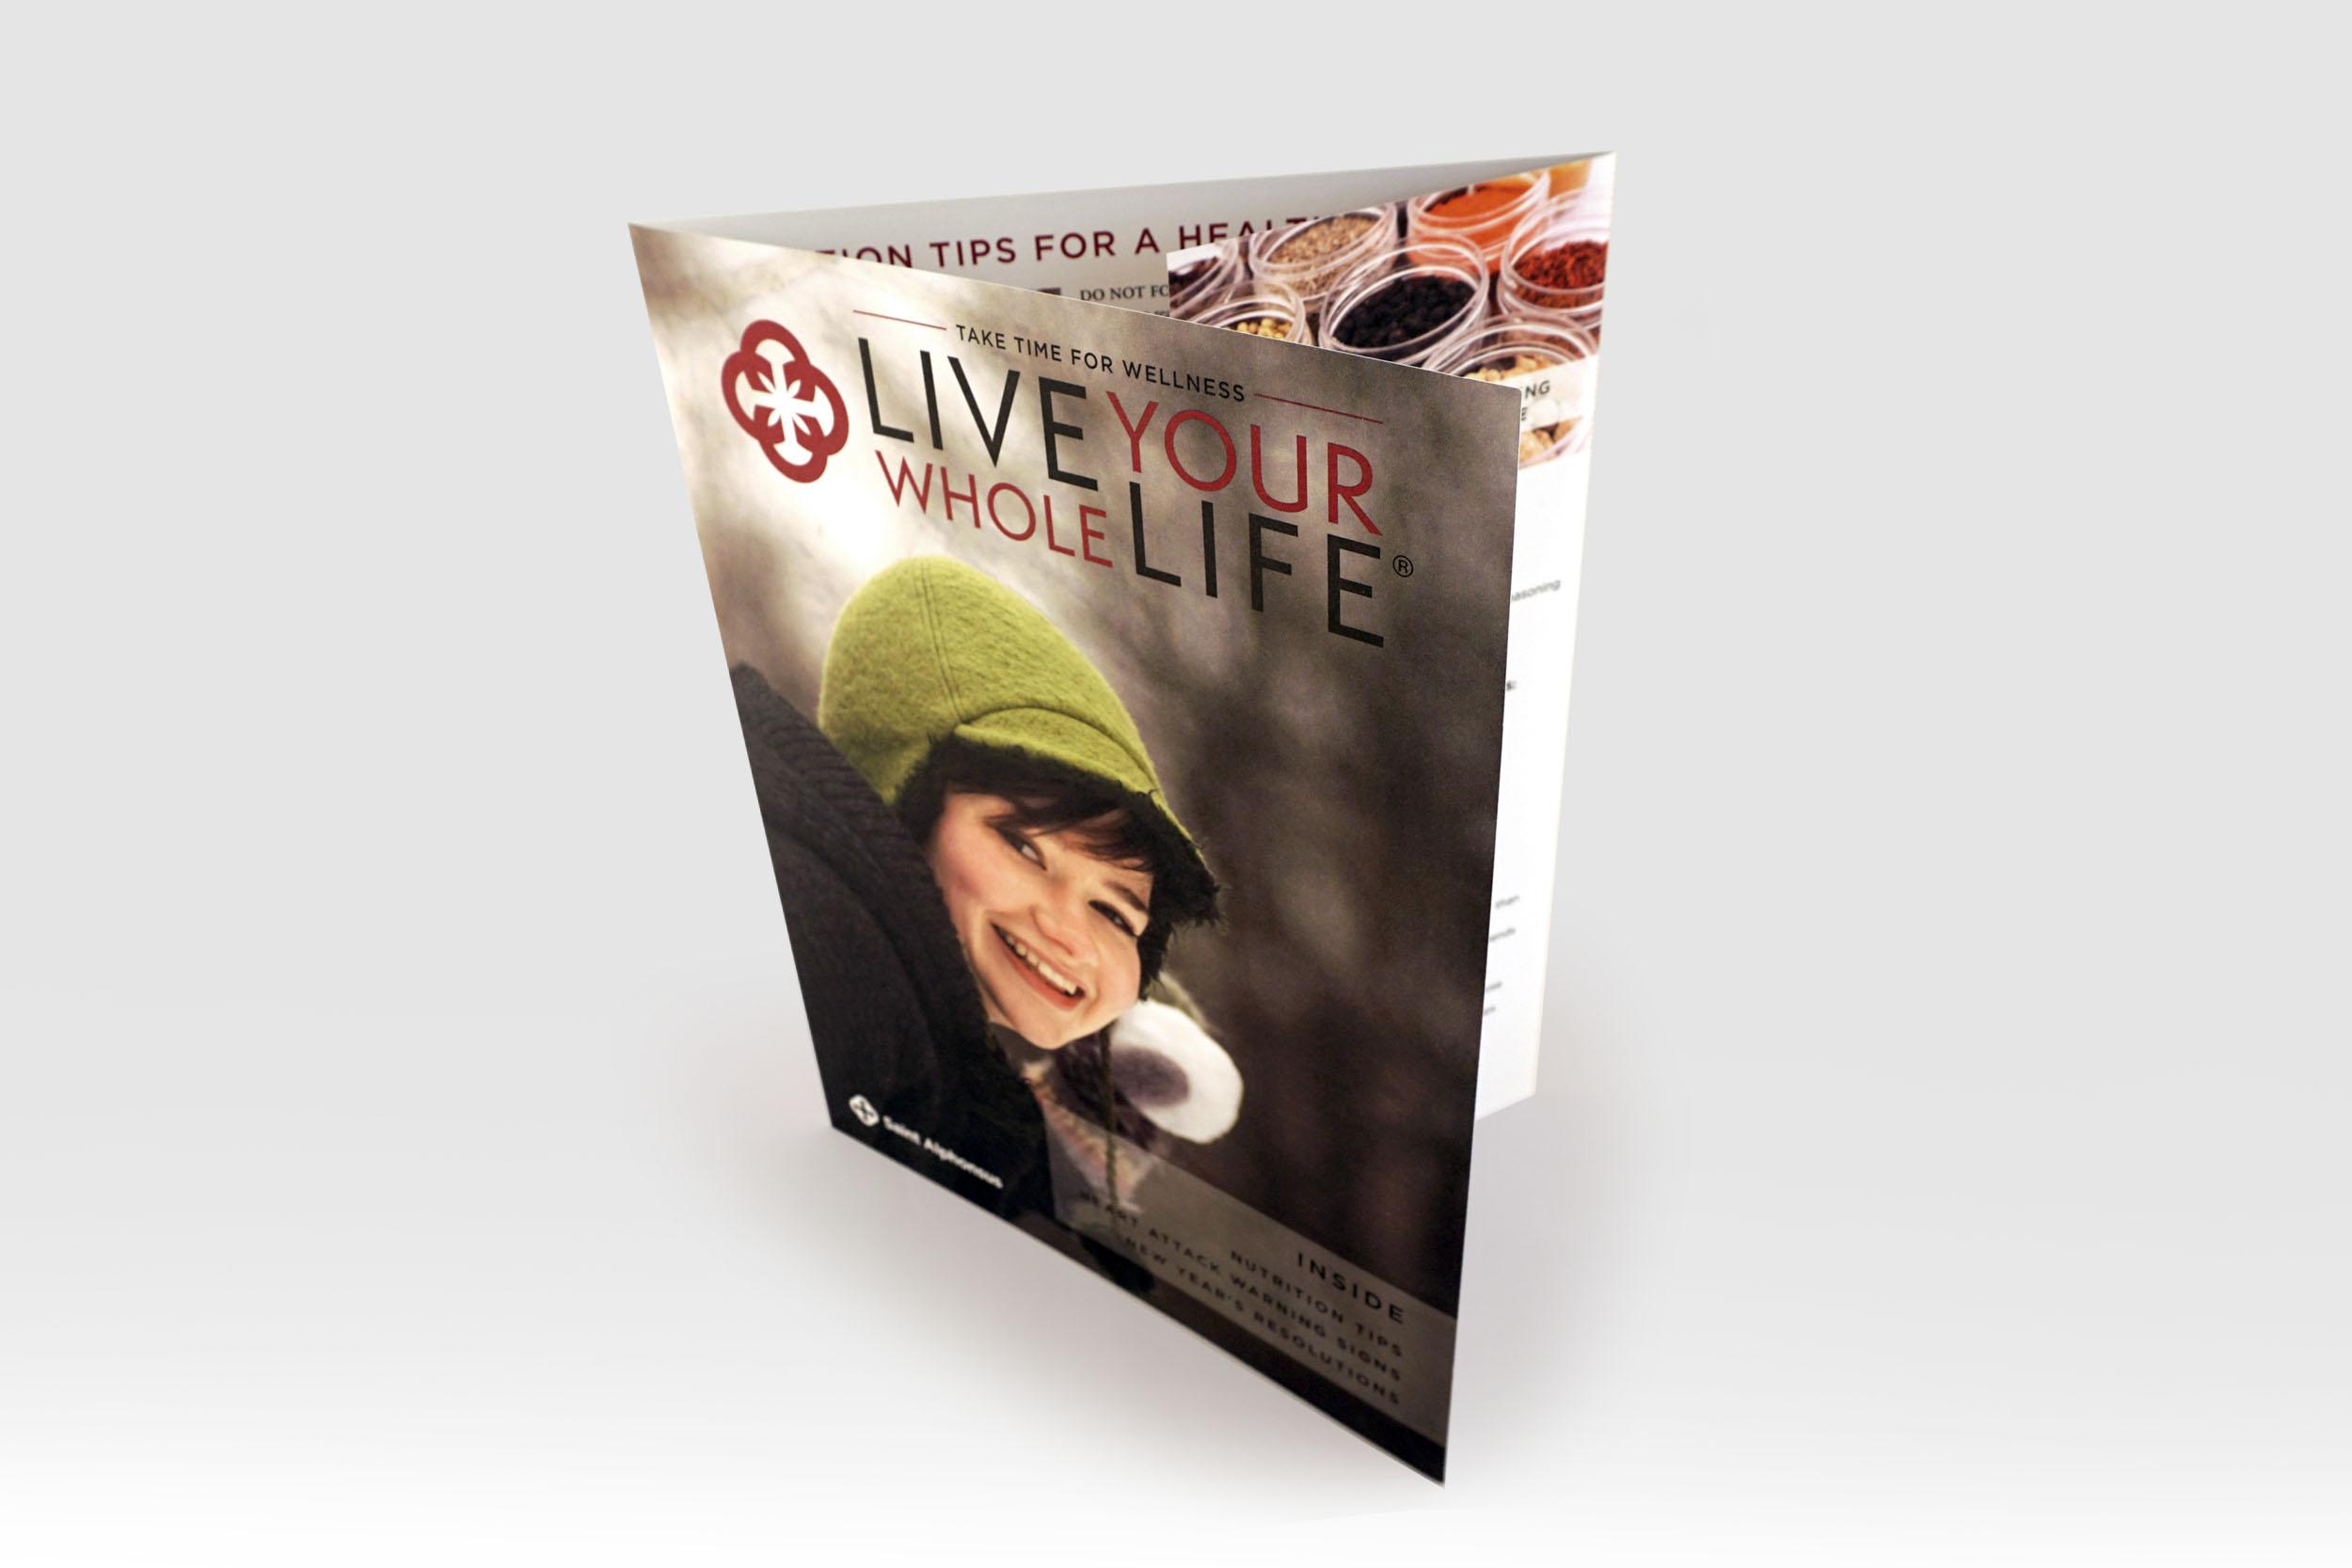 LYWL_Girl_Cover_150dpi.jpg